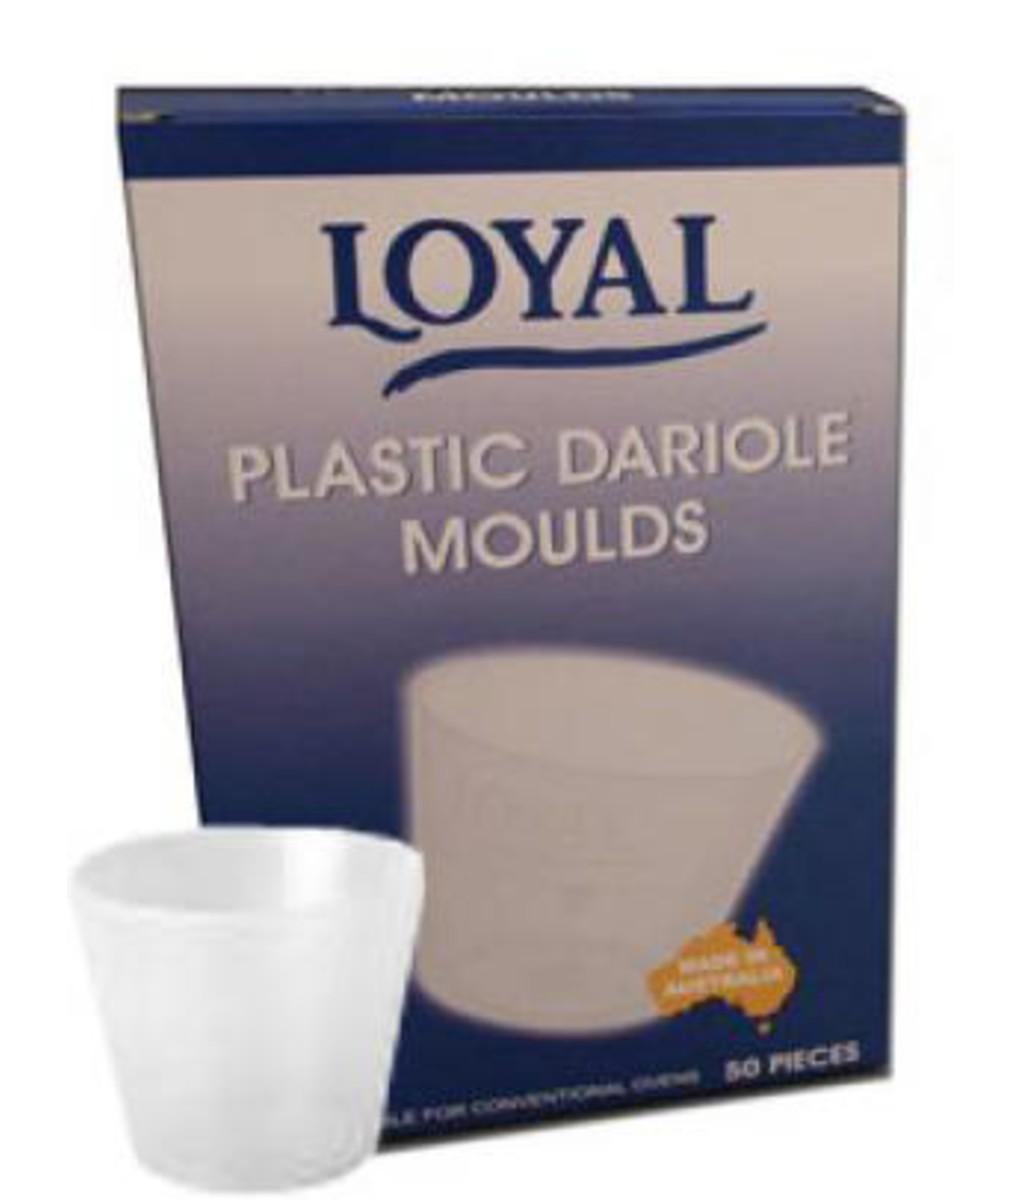 Plastic Dariole Mould 6.5cm x 5.5cm (125ml) Box by Loyal (50 units)